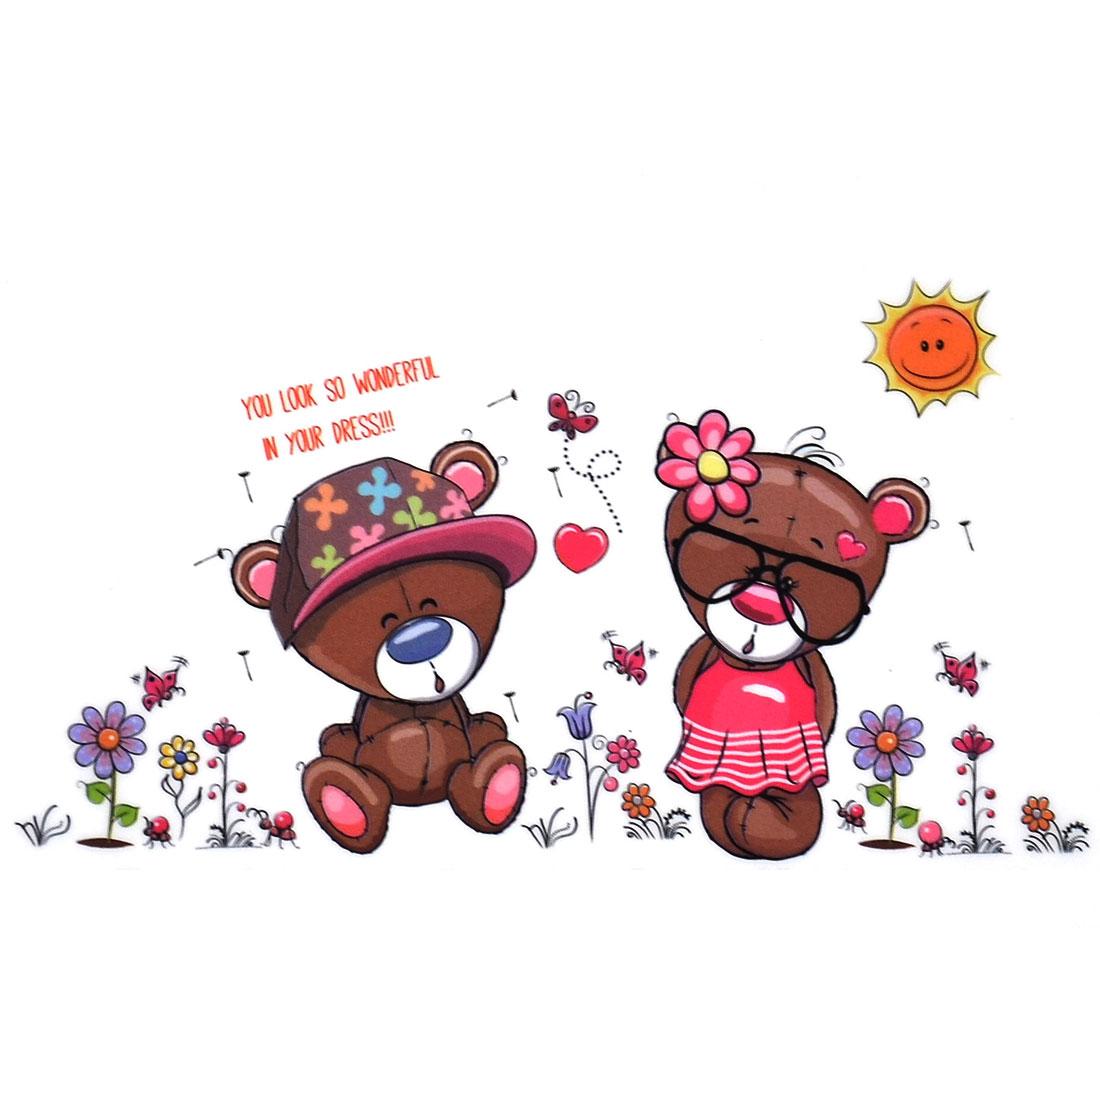 Home PVC Bears Flower Print DIY Decor Self Adhesive Wall Sticker Decal Mural 50 x 70cm